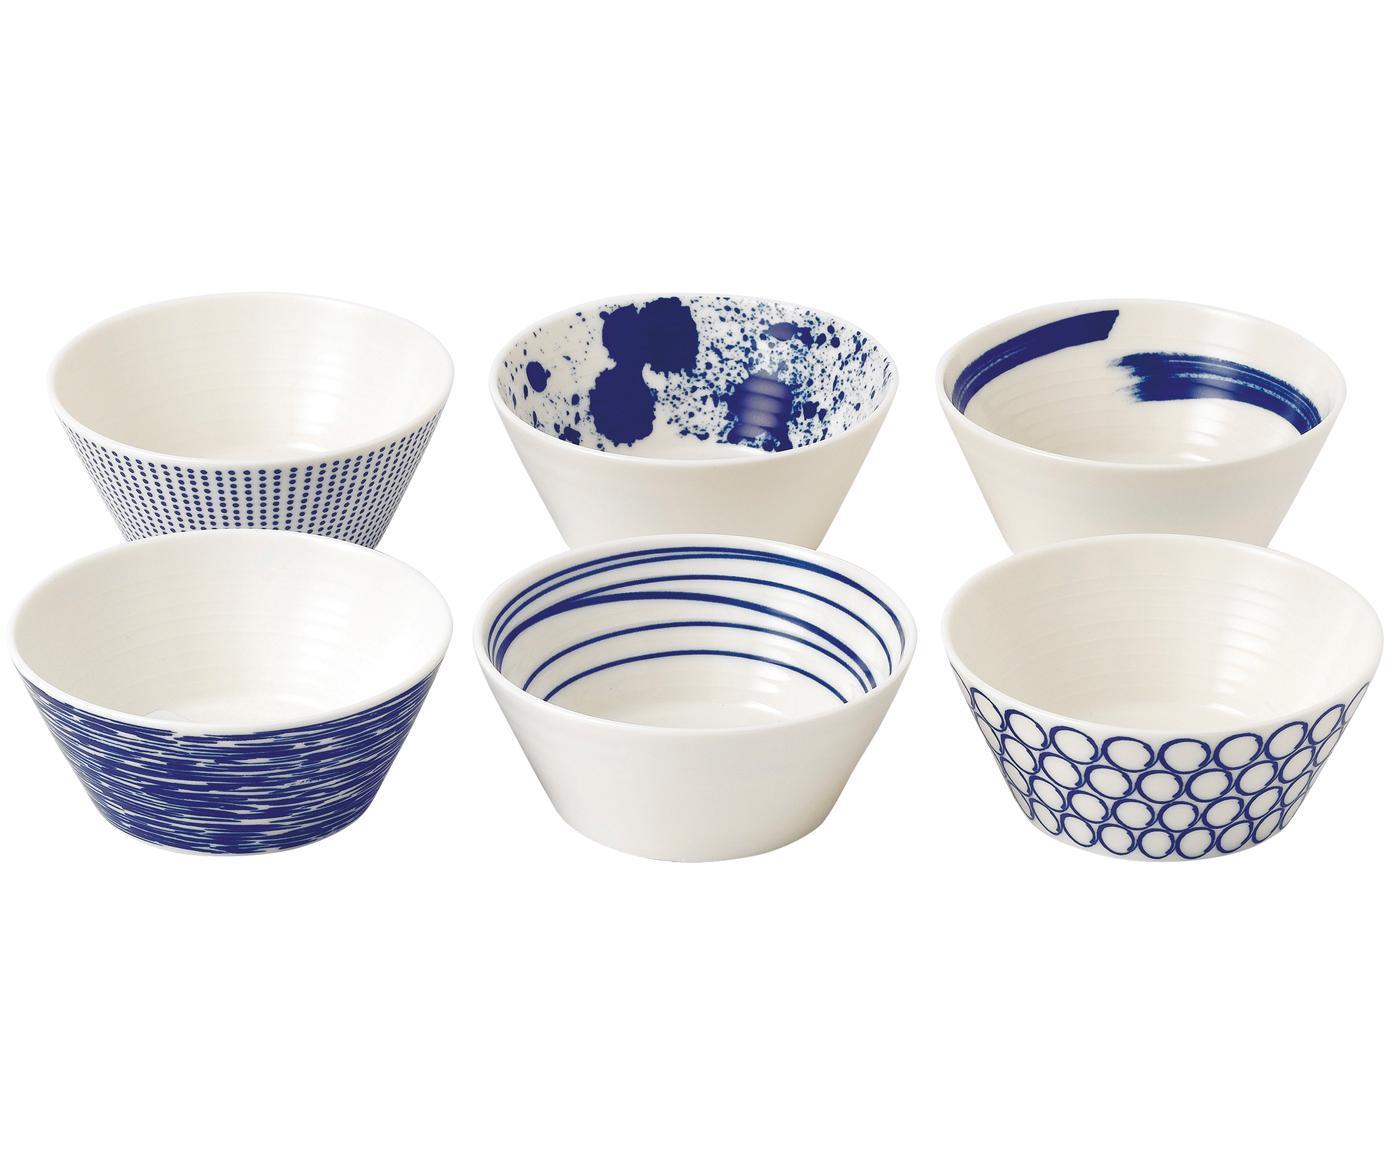 Komplet misek Pacific, 6 elem., Porcelana, Biały, niebieski, Ø 11 cm